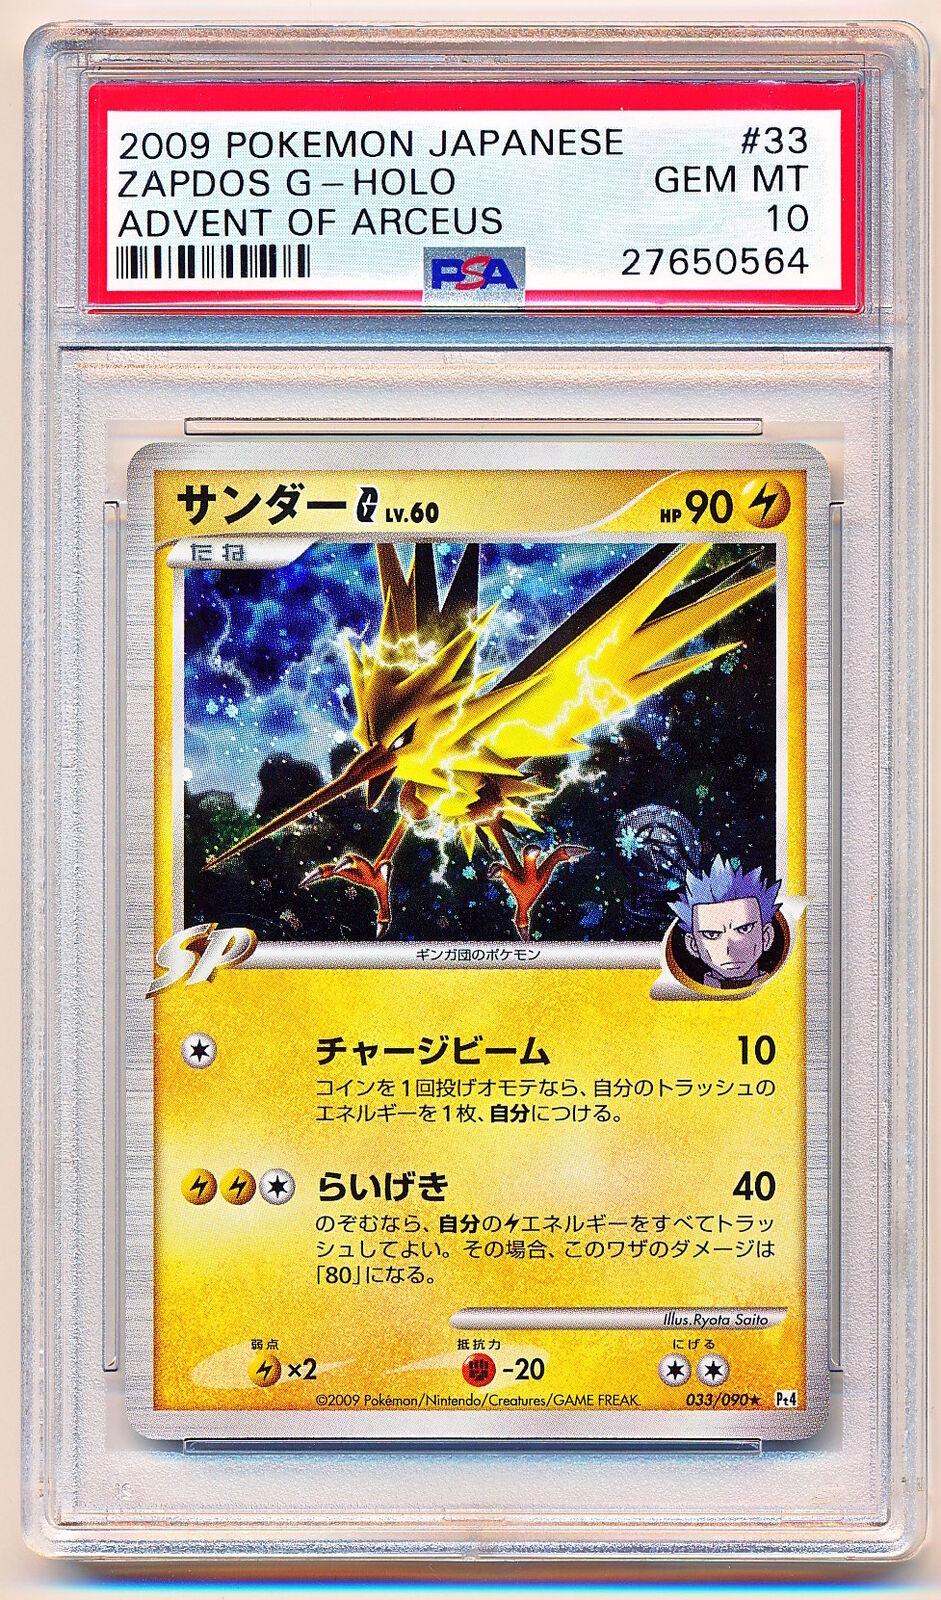 2009 Pokemon Japanese Advent of Arceus Zapdos G Holo PSA 10 - POP 3